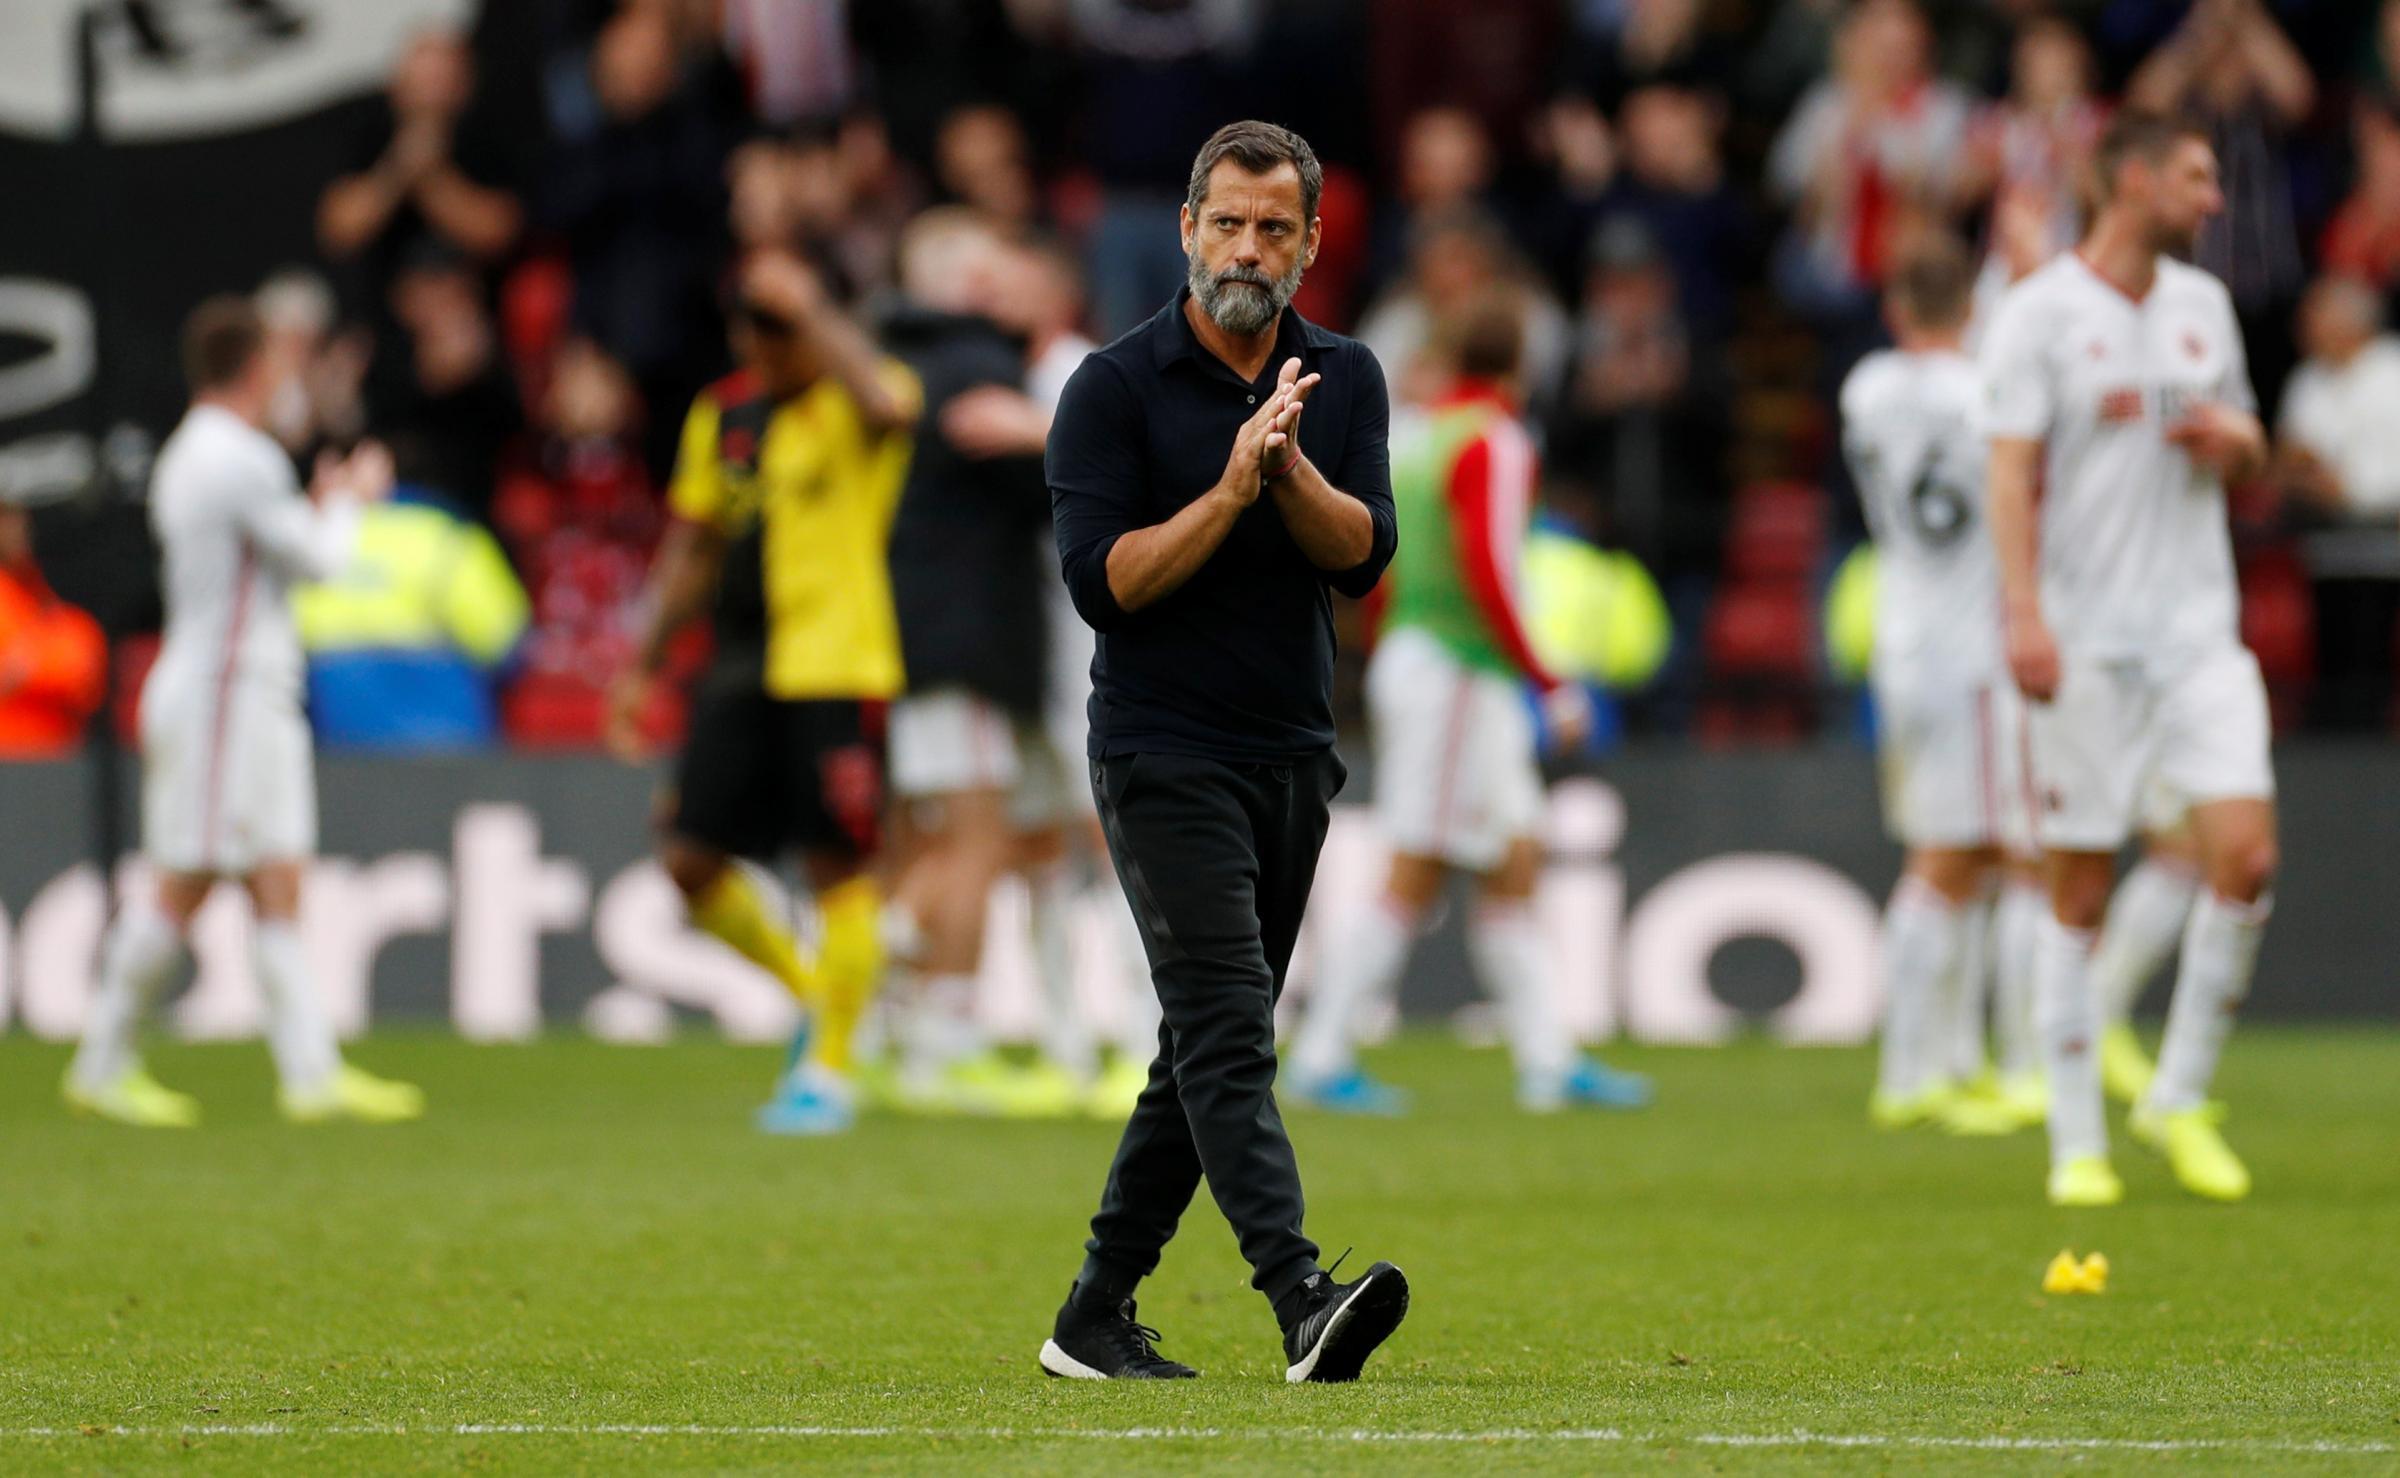 Quqiue Sanchez Flores feels a more confident Watford would have beaten Sheffield United